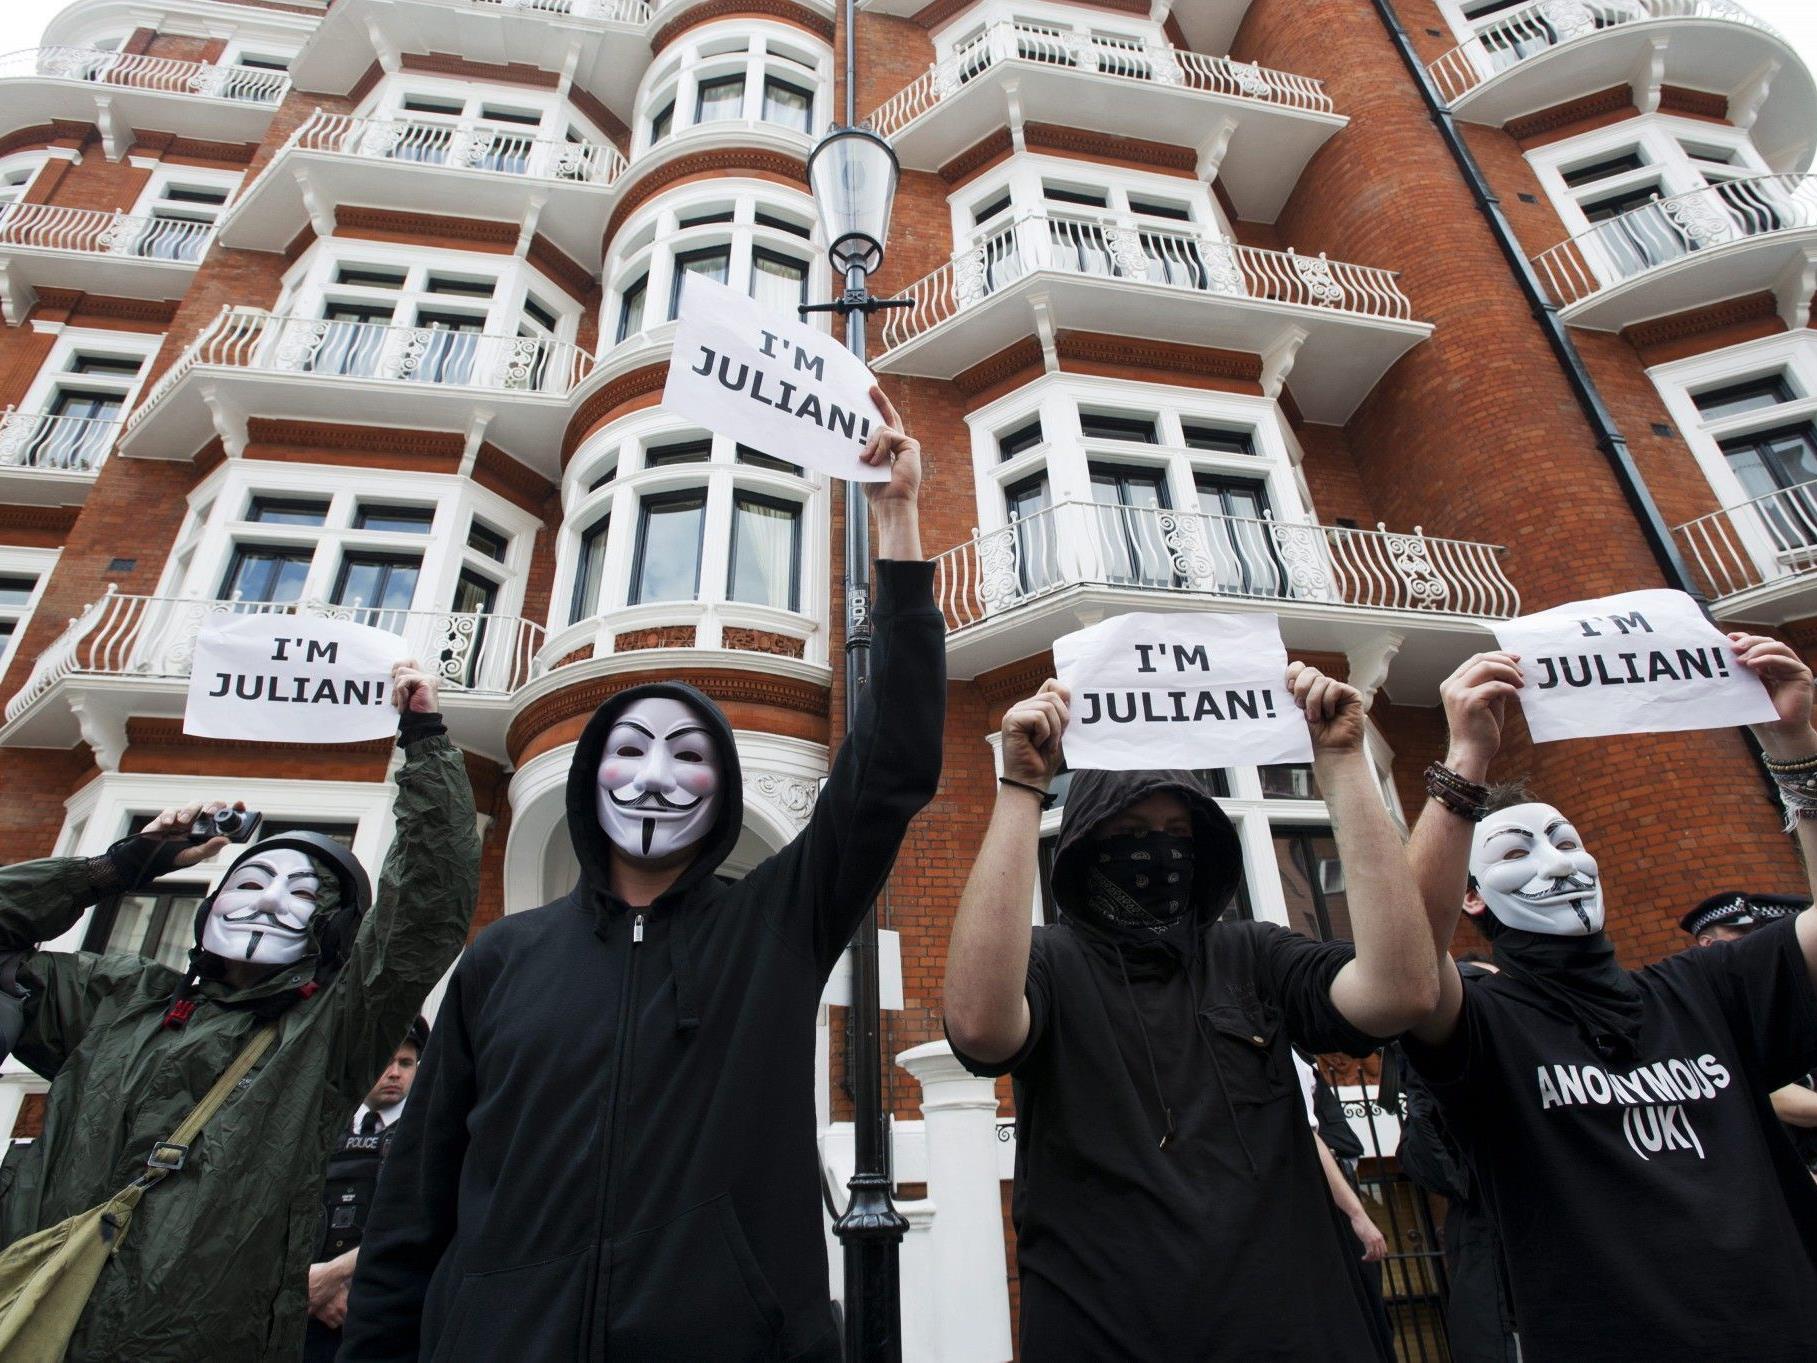 Haftbefehl in Schweden gegen Wikileaks-Gründer wegen Sexualdelikten.